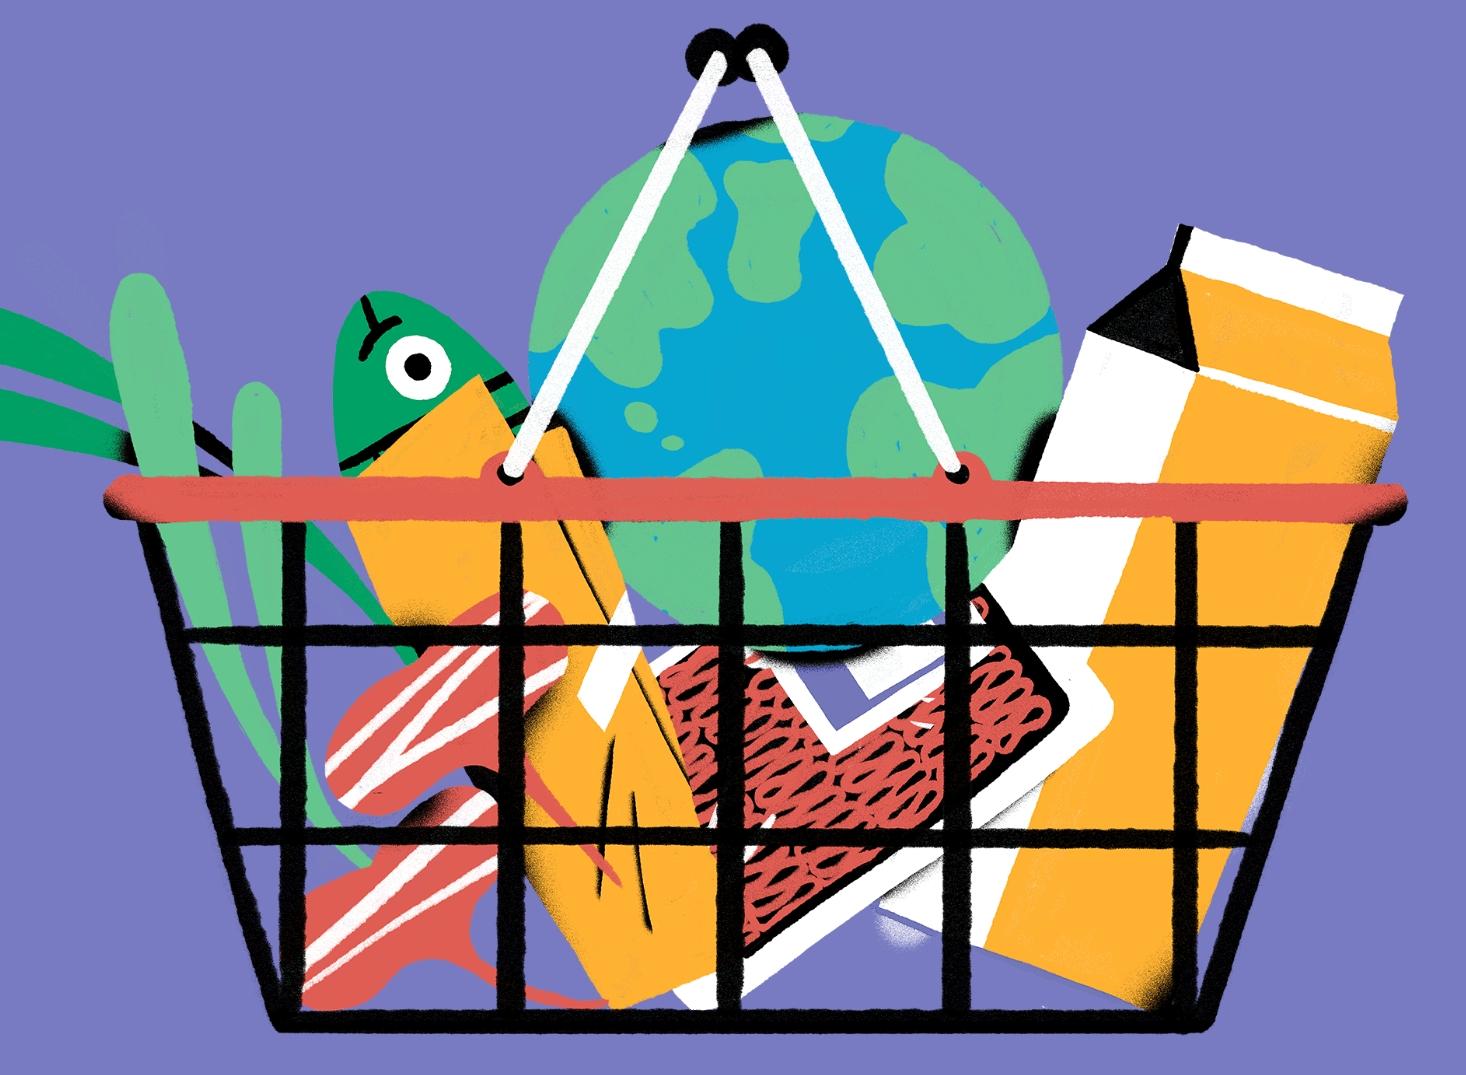 shopping illustration